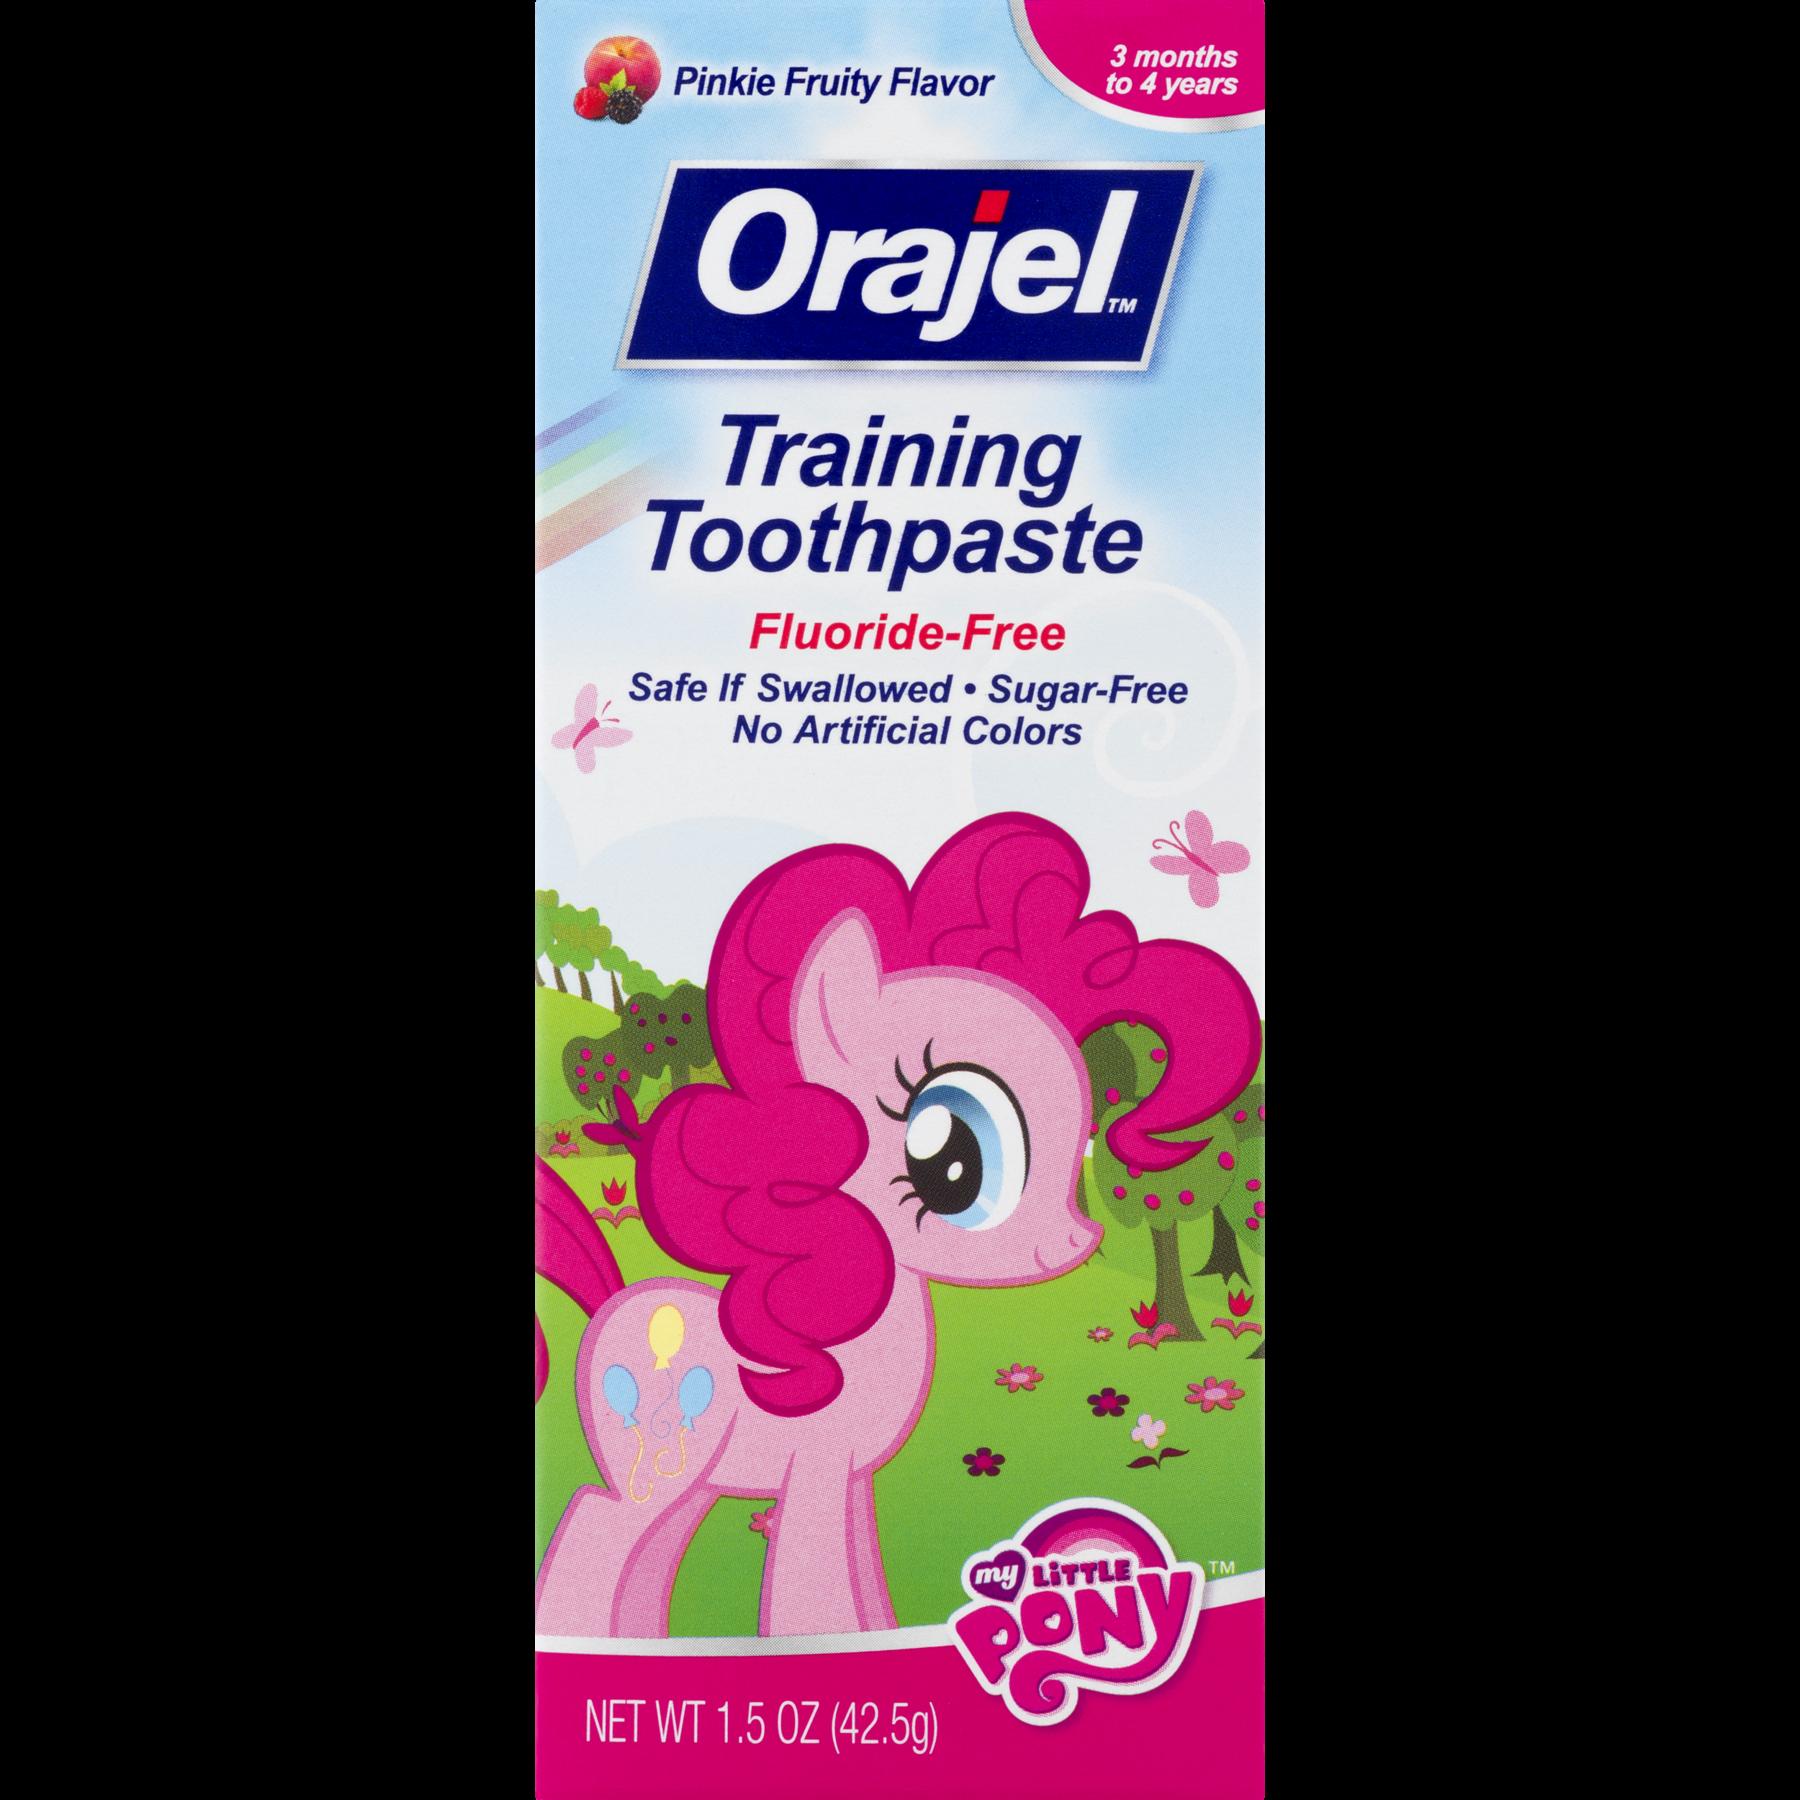 Orajel Training Toothpaste Fluoride-Free My Little Pony, 1.5 OZ